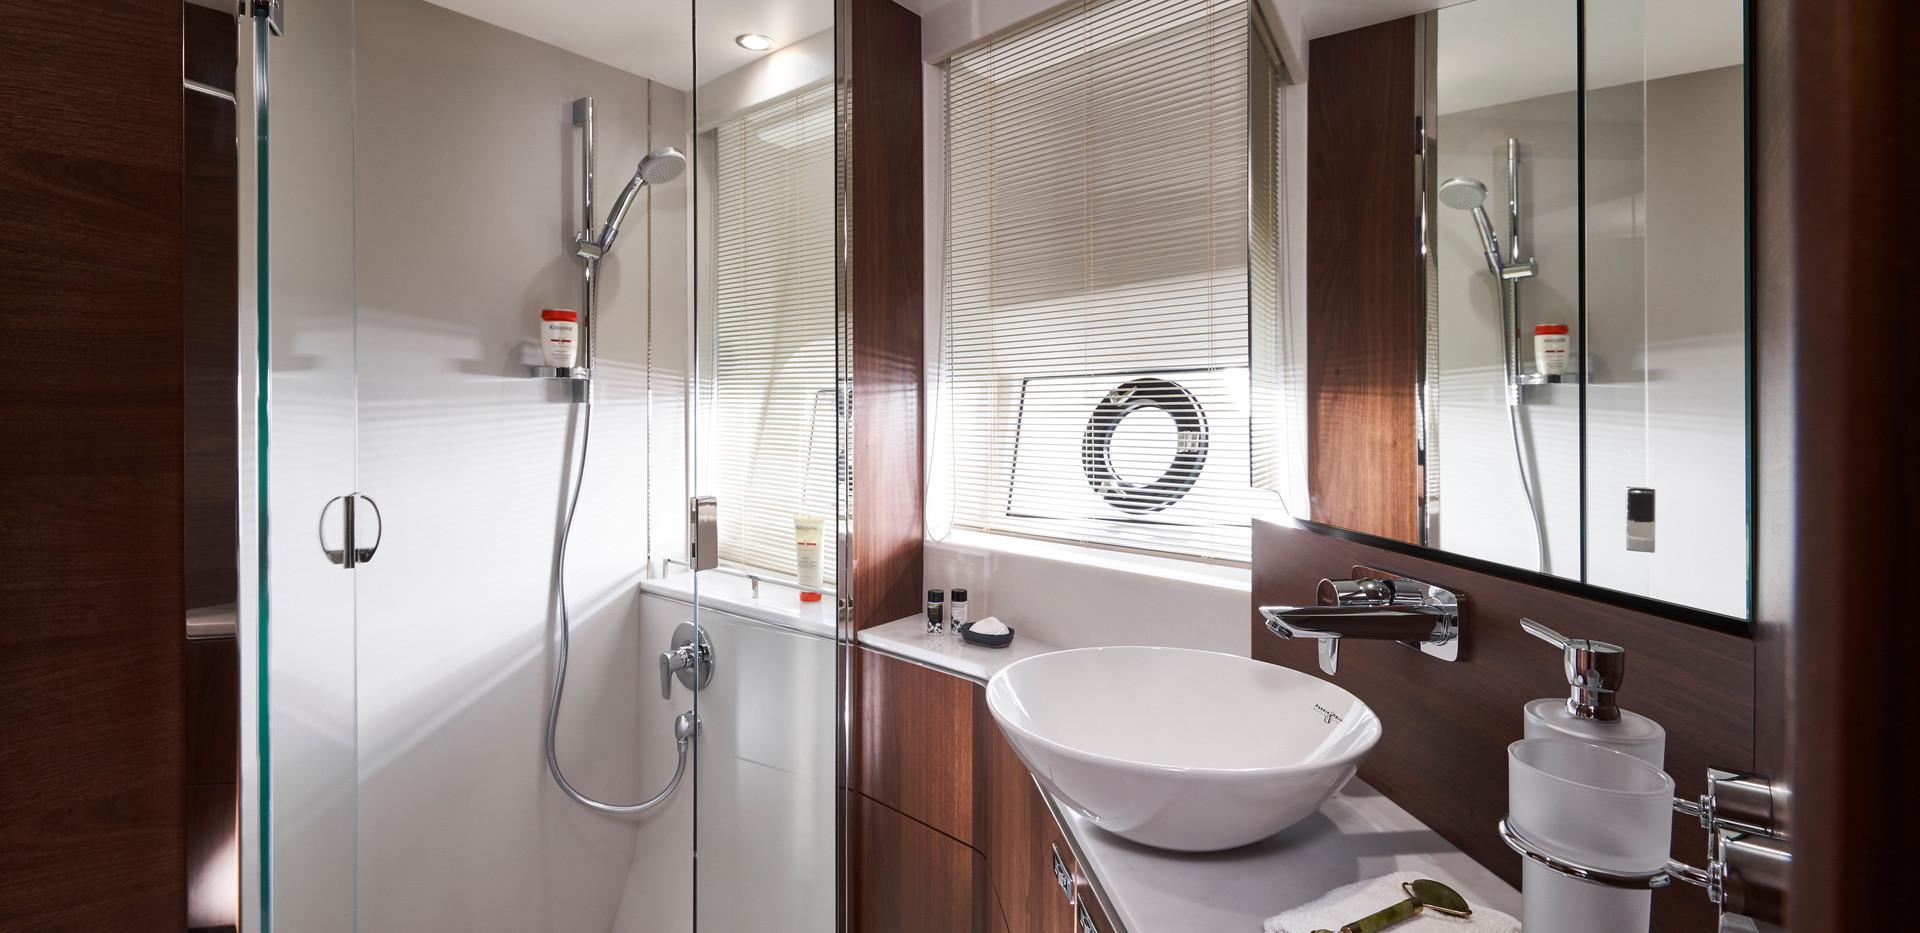 s66-interior-forward-cabin-bathroom-waln